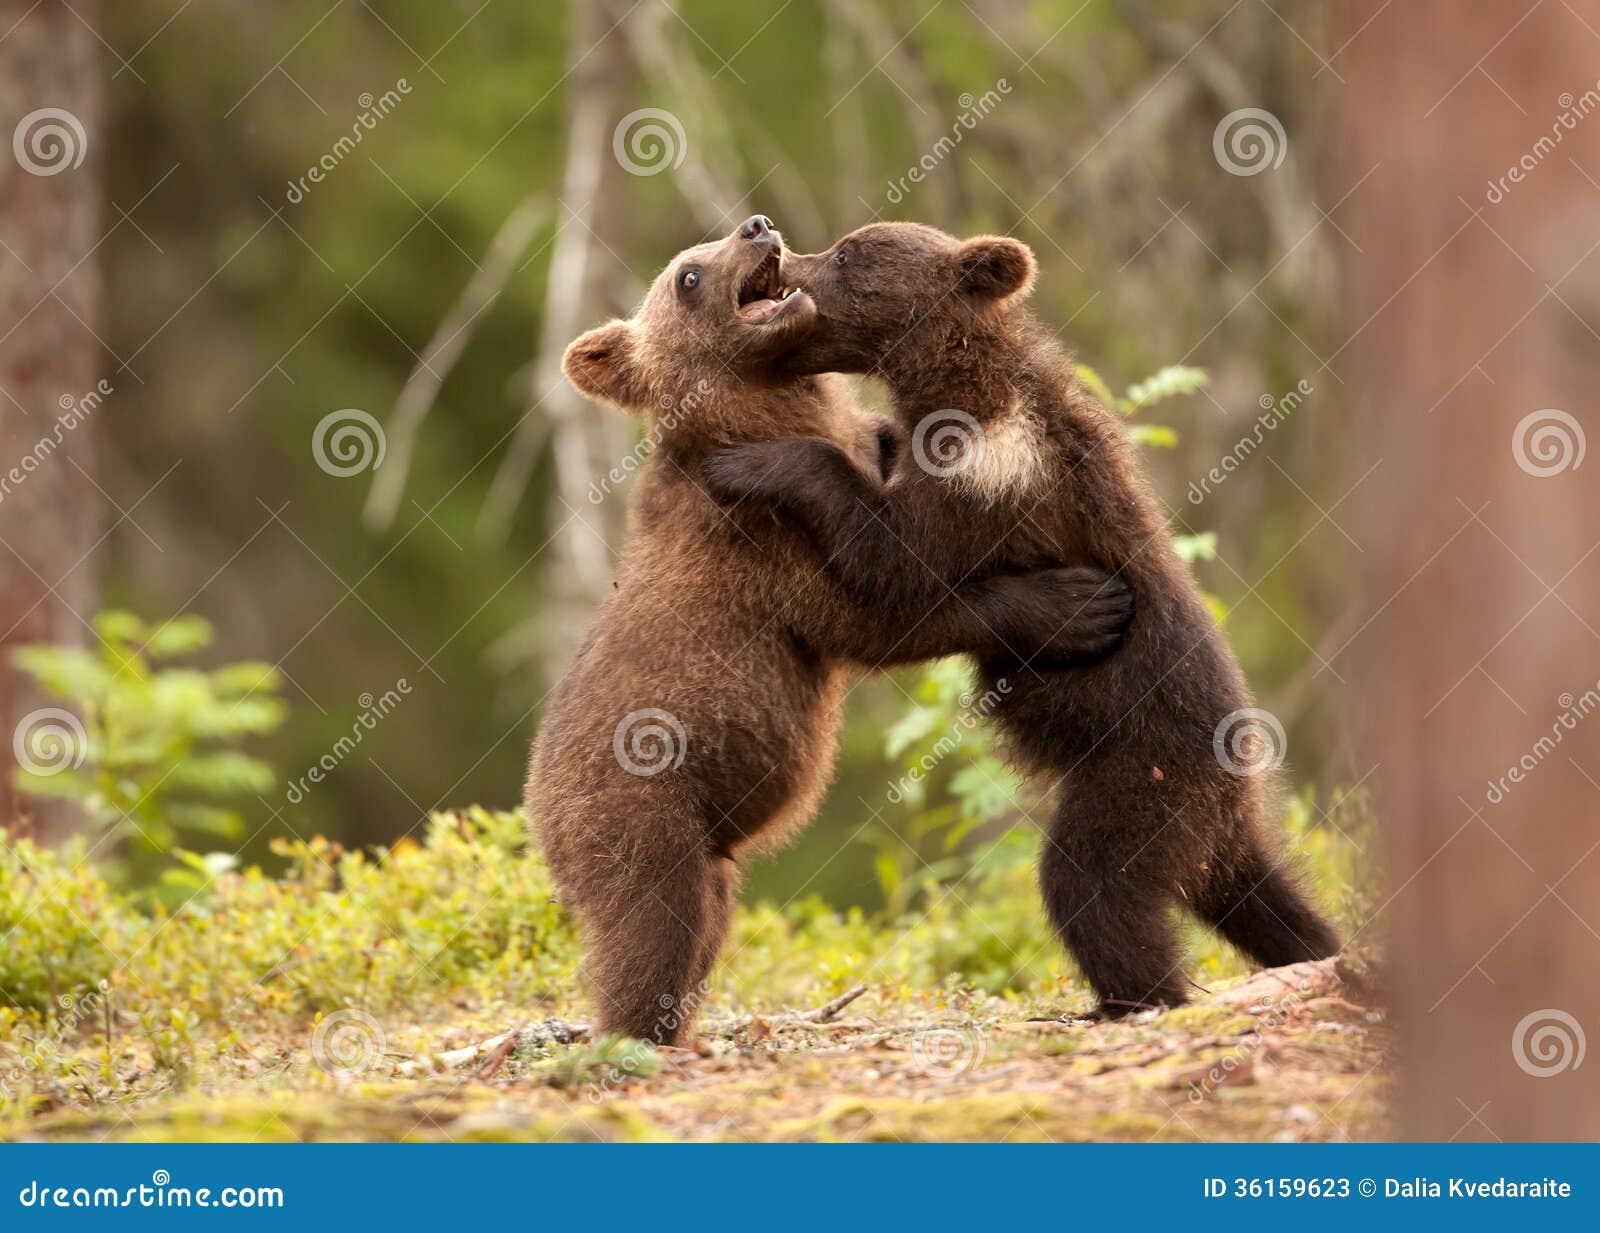 eurasian brown bear ursos arctos cubs stock image image 36159623. Black Bedroom Furniture Sets. Home Design Ideas